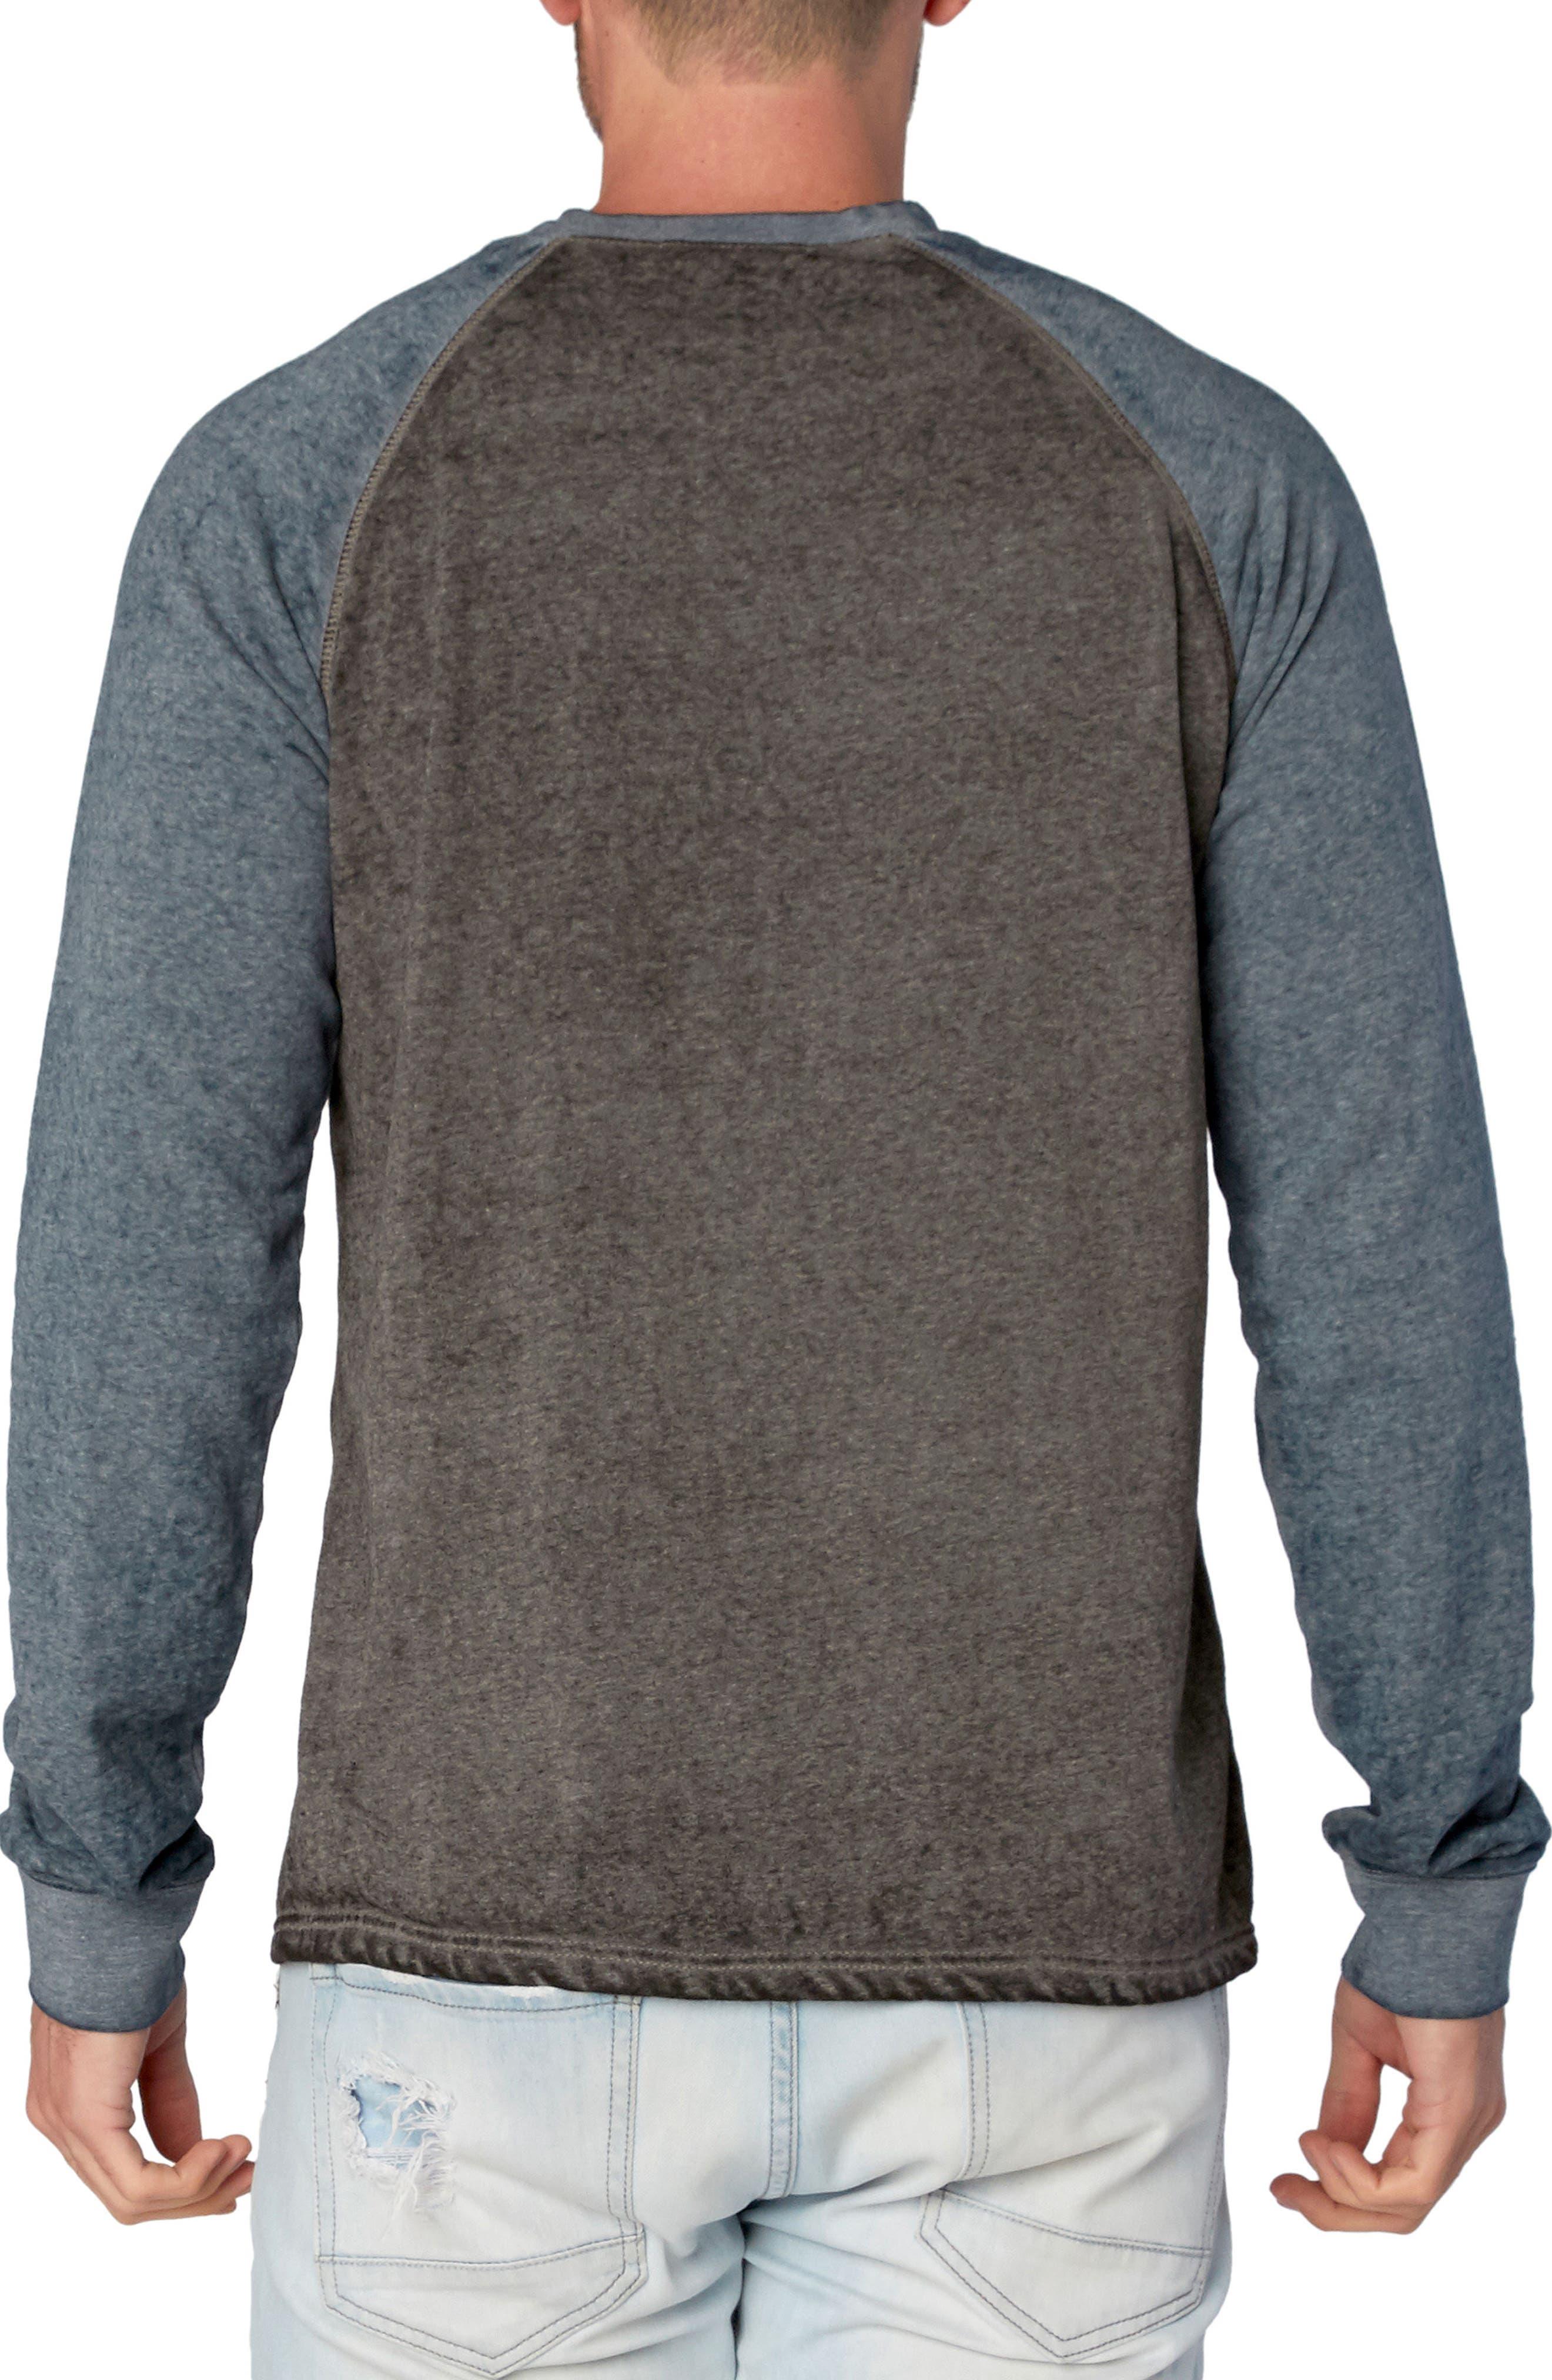 Washed Raglan Sleeve Sweatshirt,                             Alternate thumbnail 2, color,                             Black/ Raw Denim